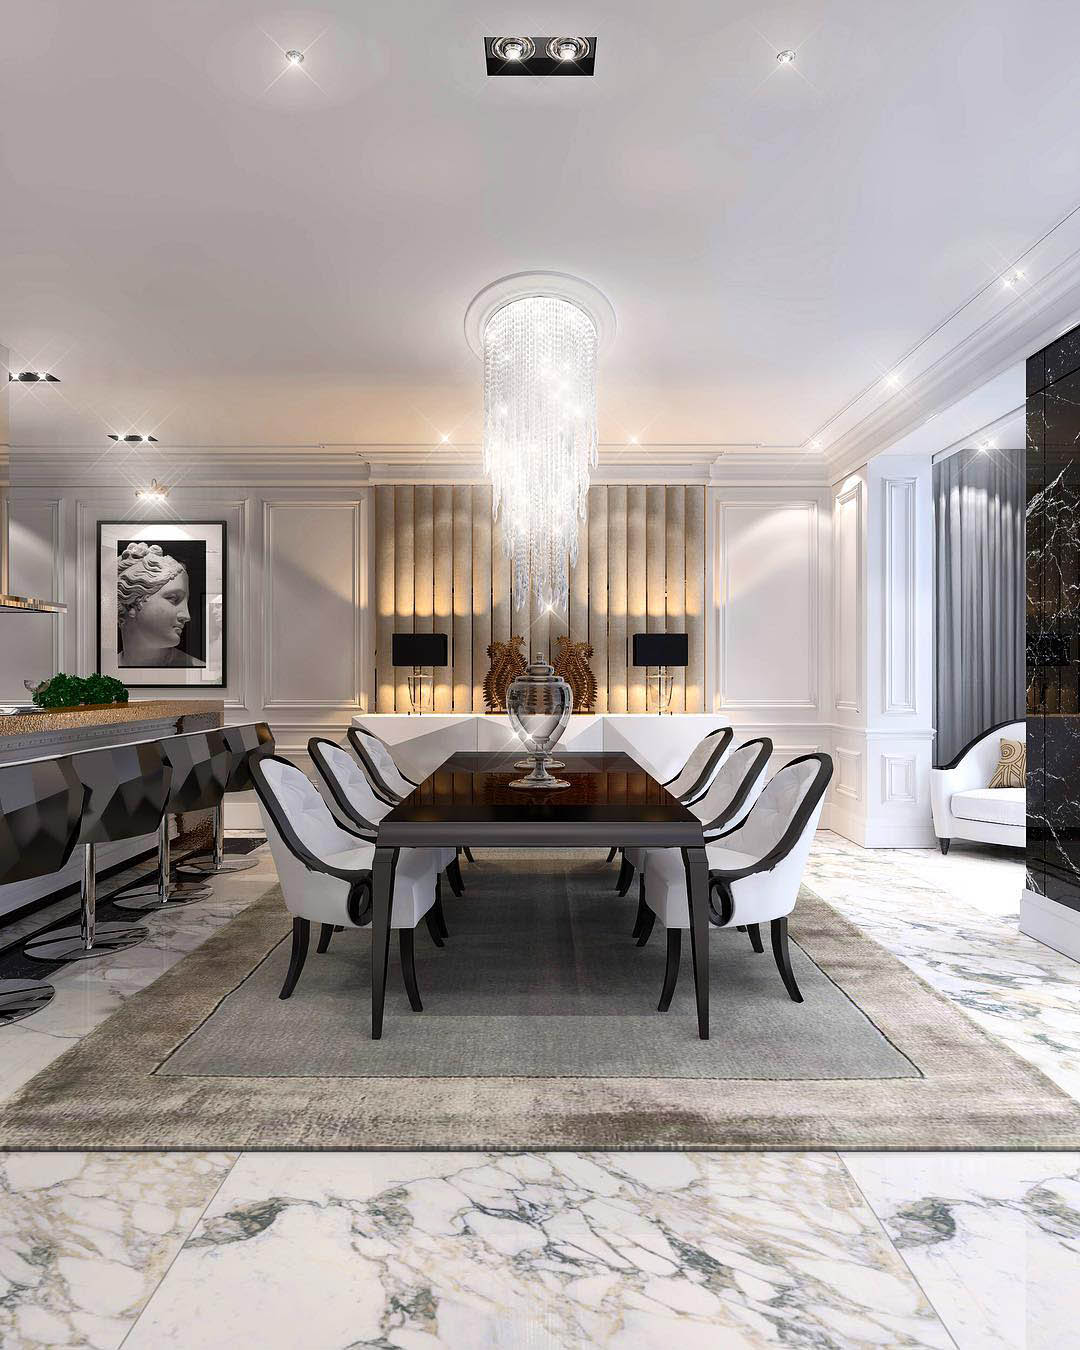 Glamorous Dining Room Ideas | Constantin Frolov Interior Design